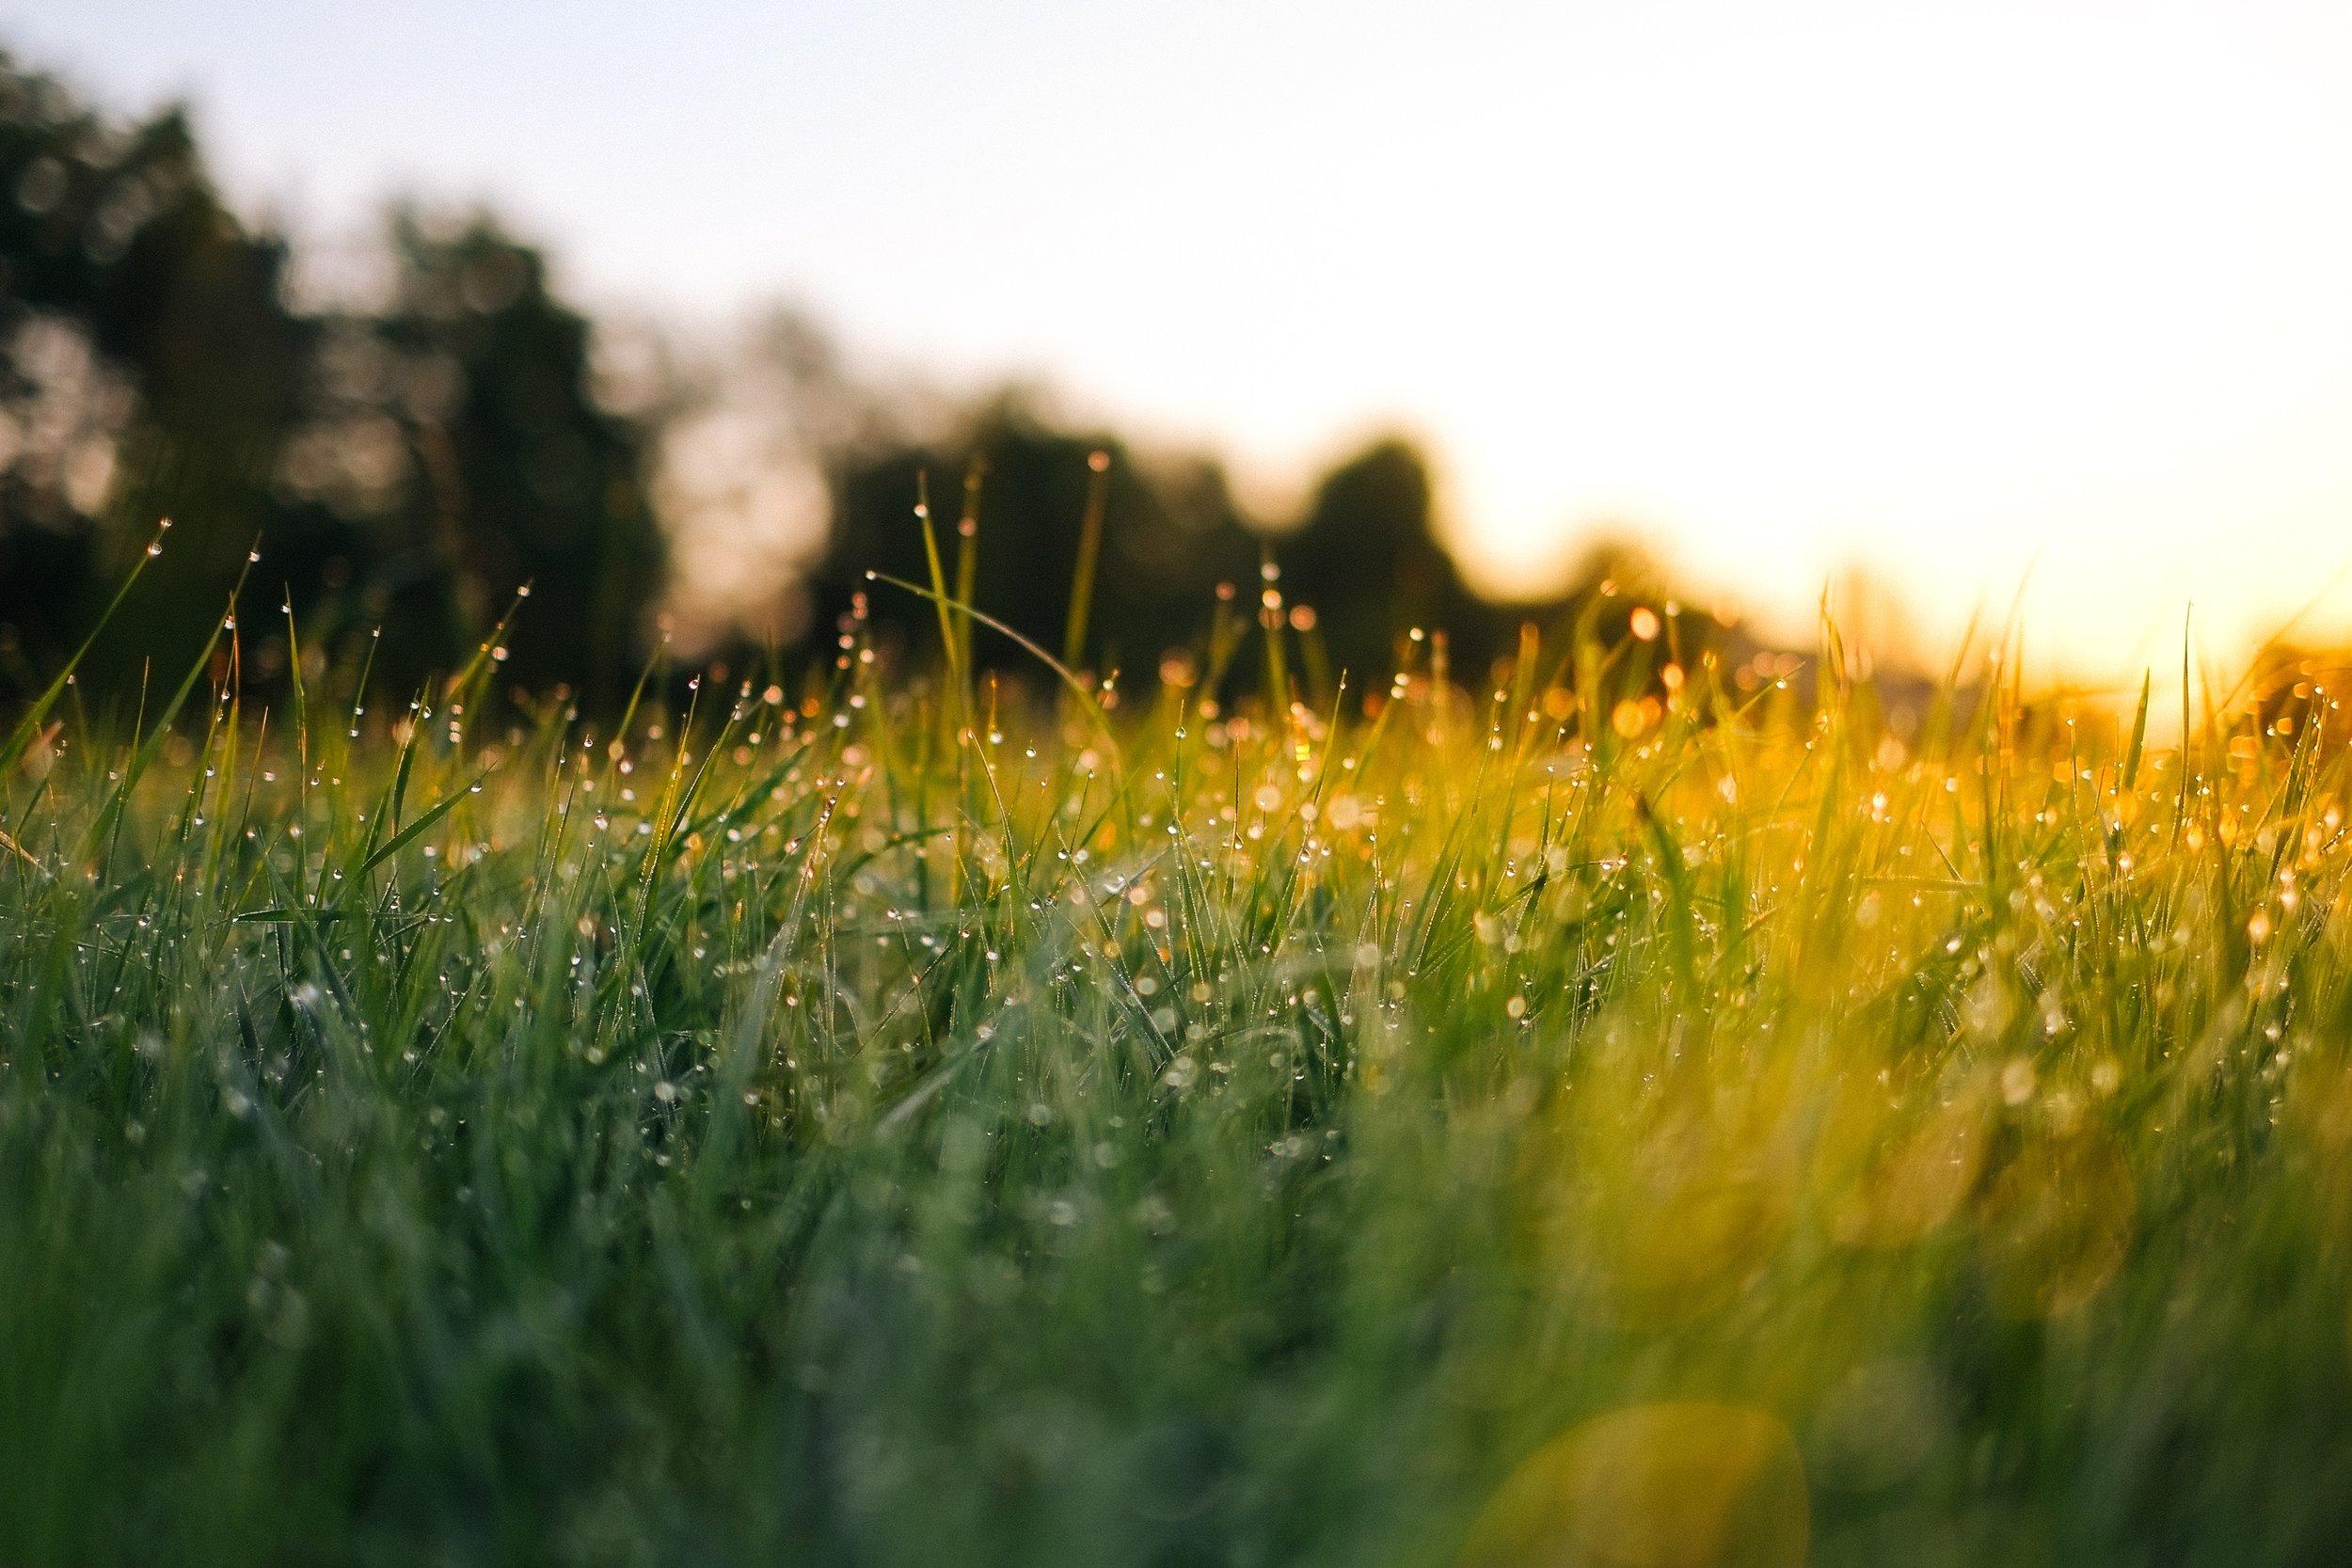 GRASS-unsplash.jpg